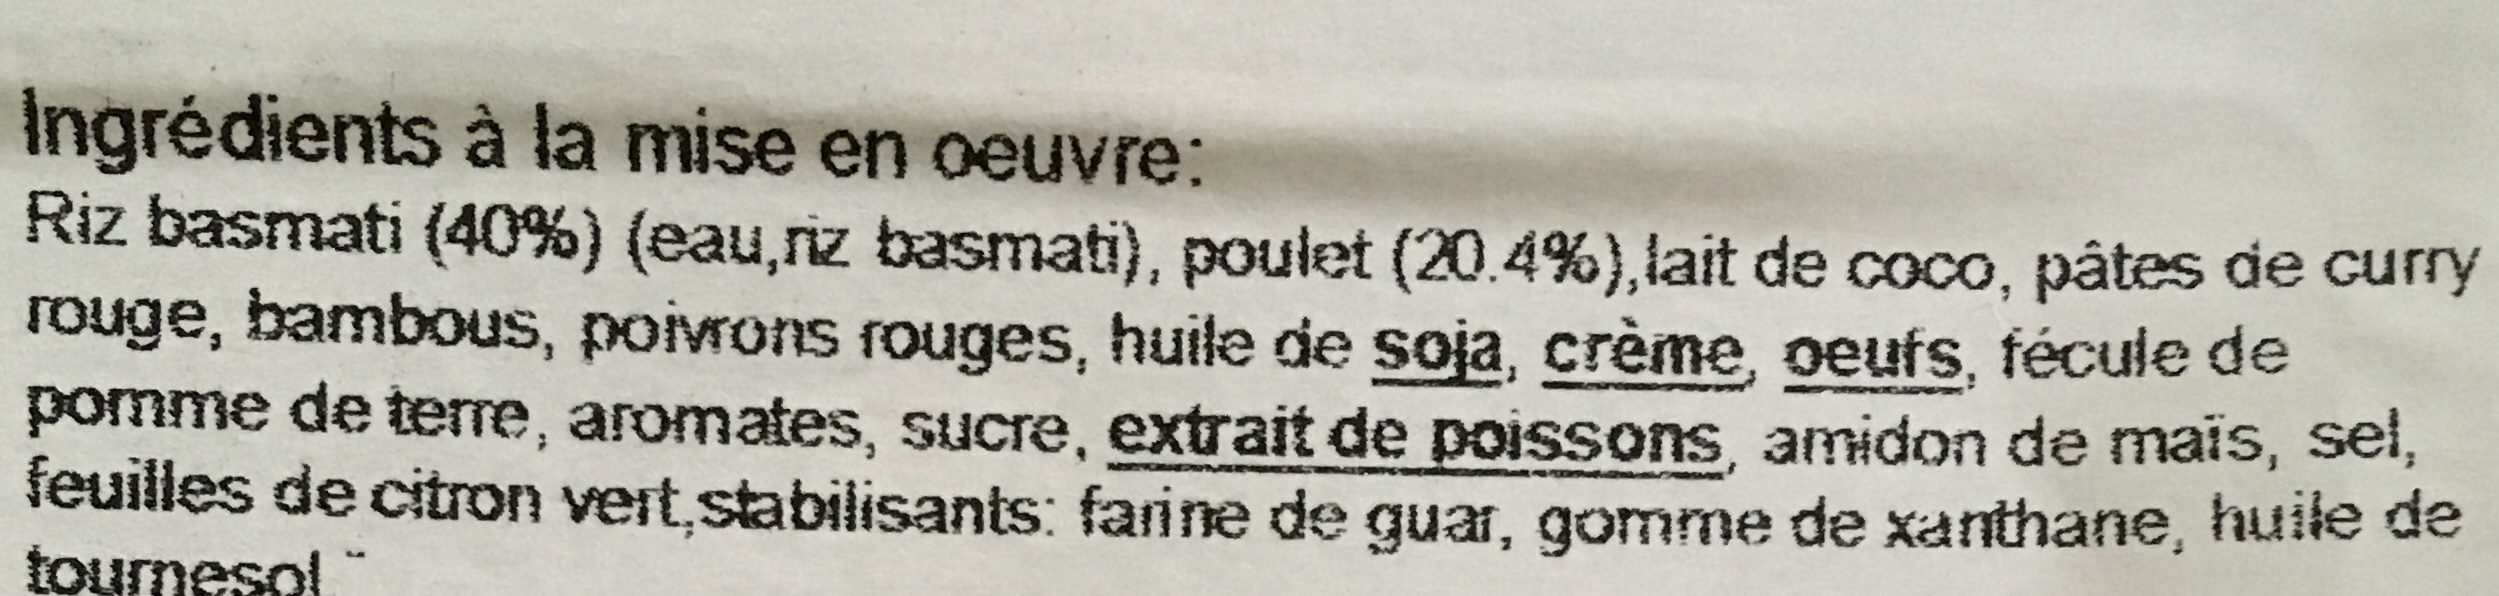 Poulet de curry rouge - Ingrediënten - fr